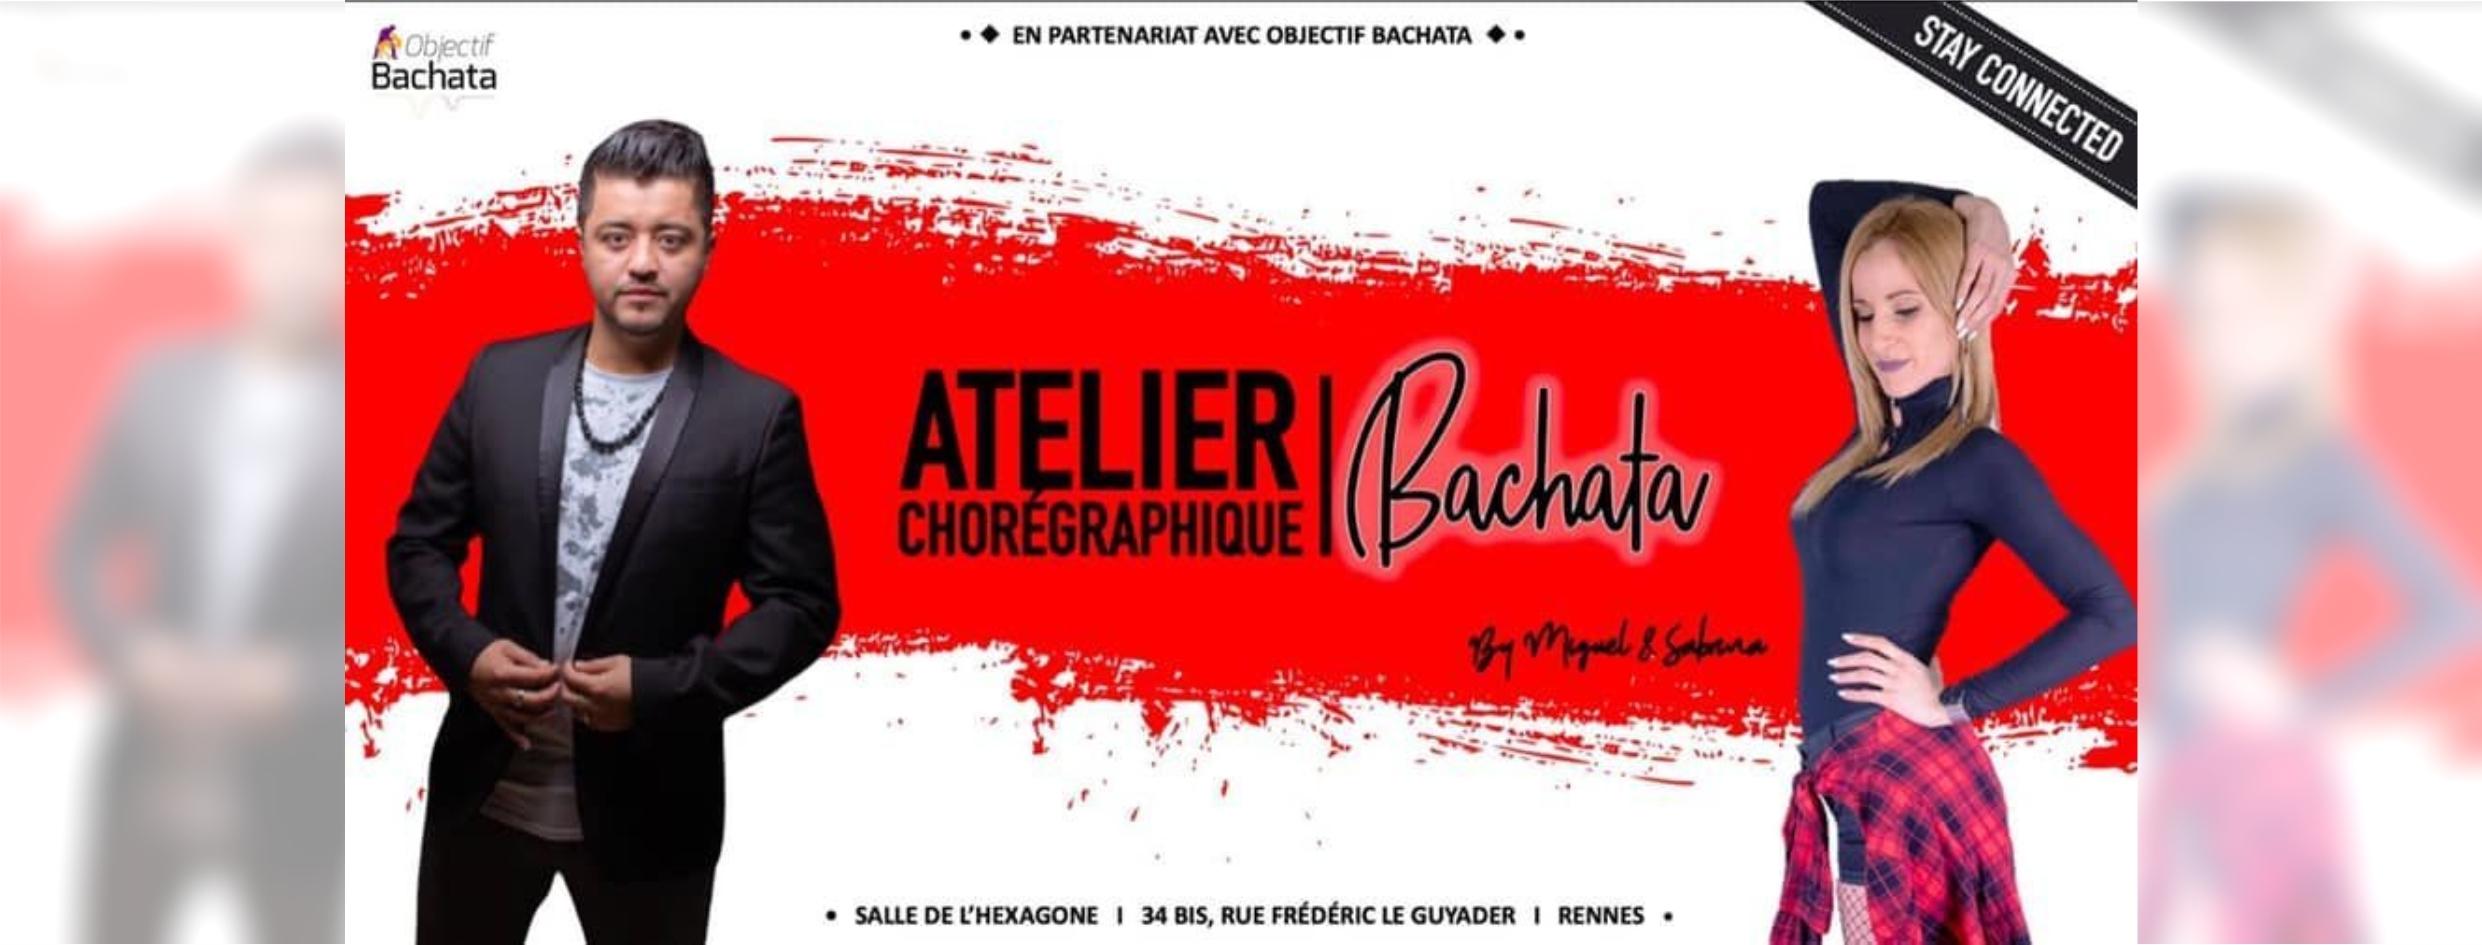 Atelier_choregraphique-2